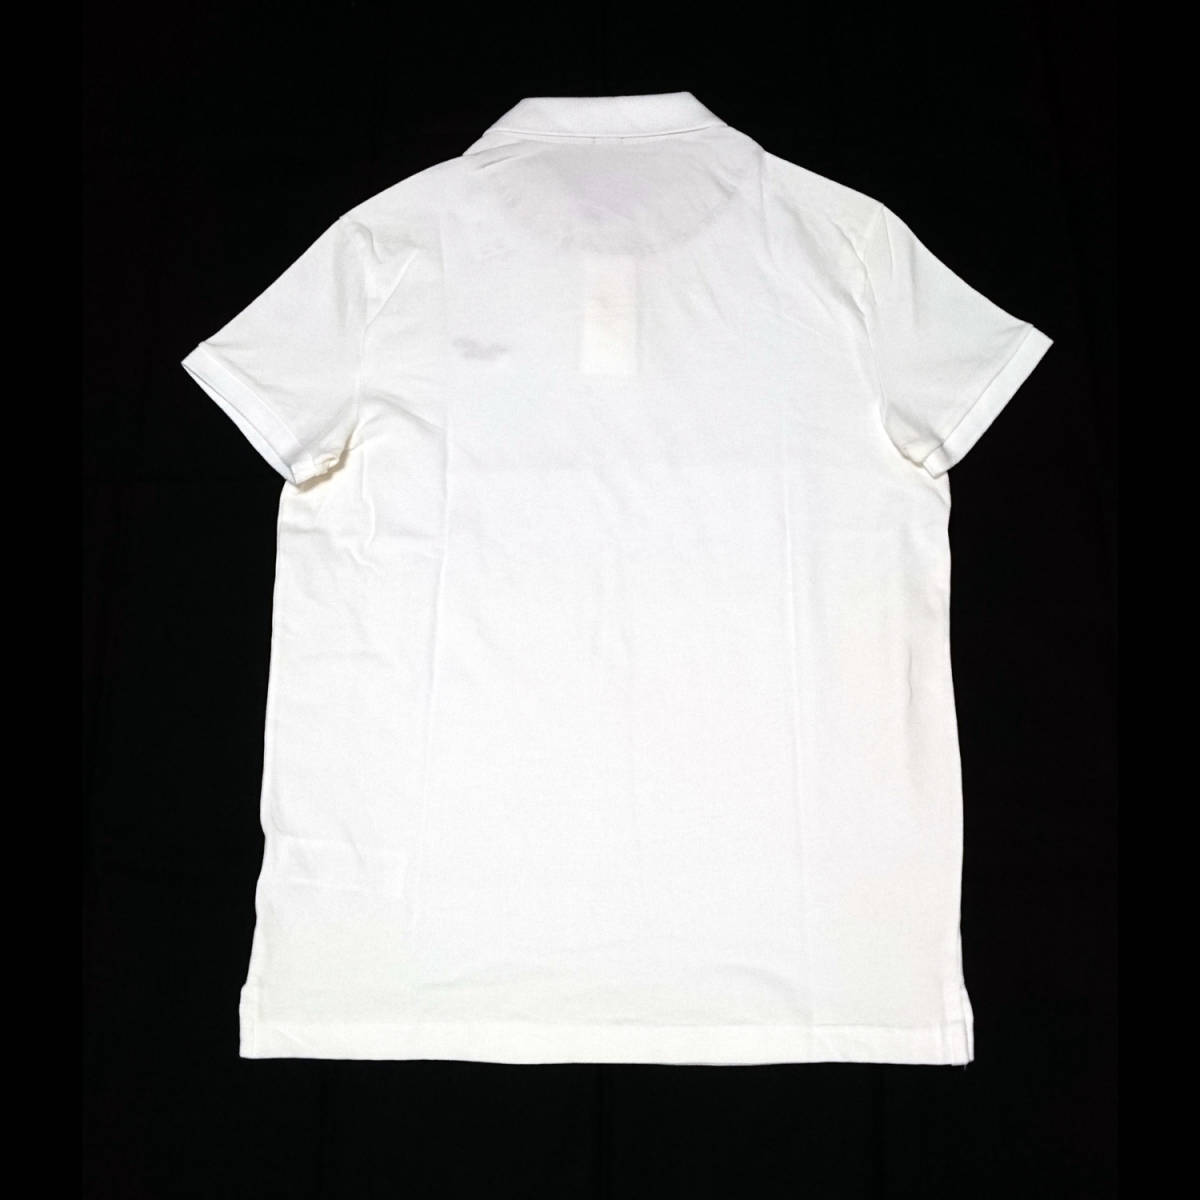 Hollister ホリスター 半袖ポロシャツ カノコ 胸ロゴ ワンポイントロゴ 刺繍 ホワイト Sサイズ(USサイズ) 新品